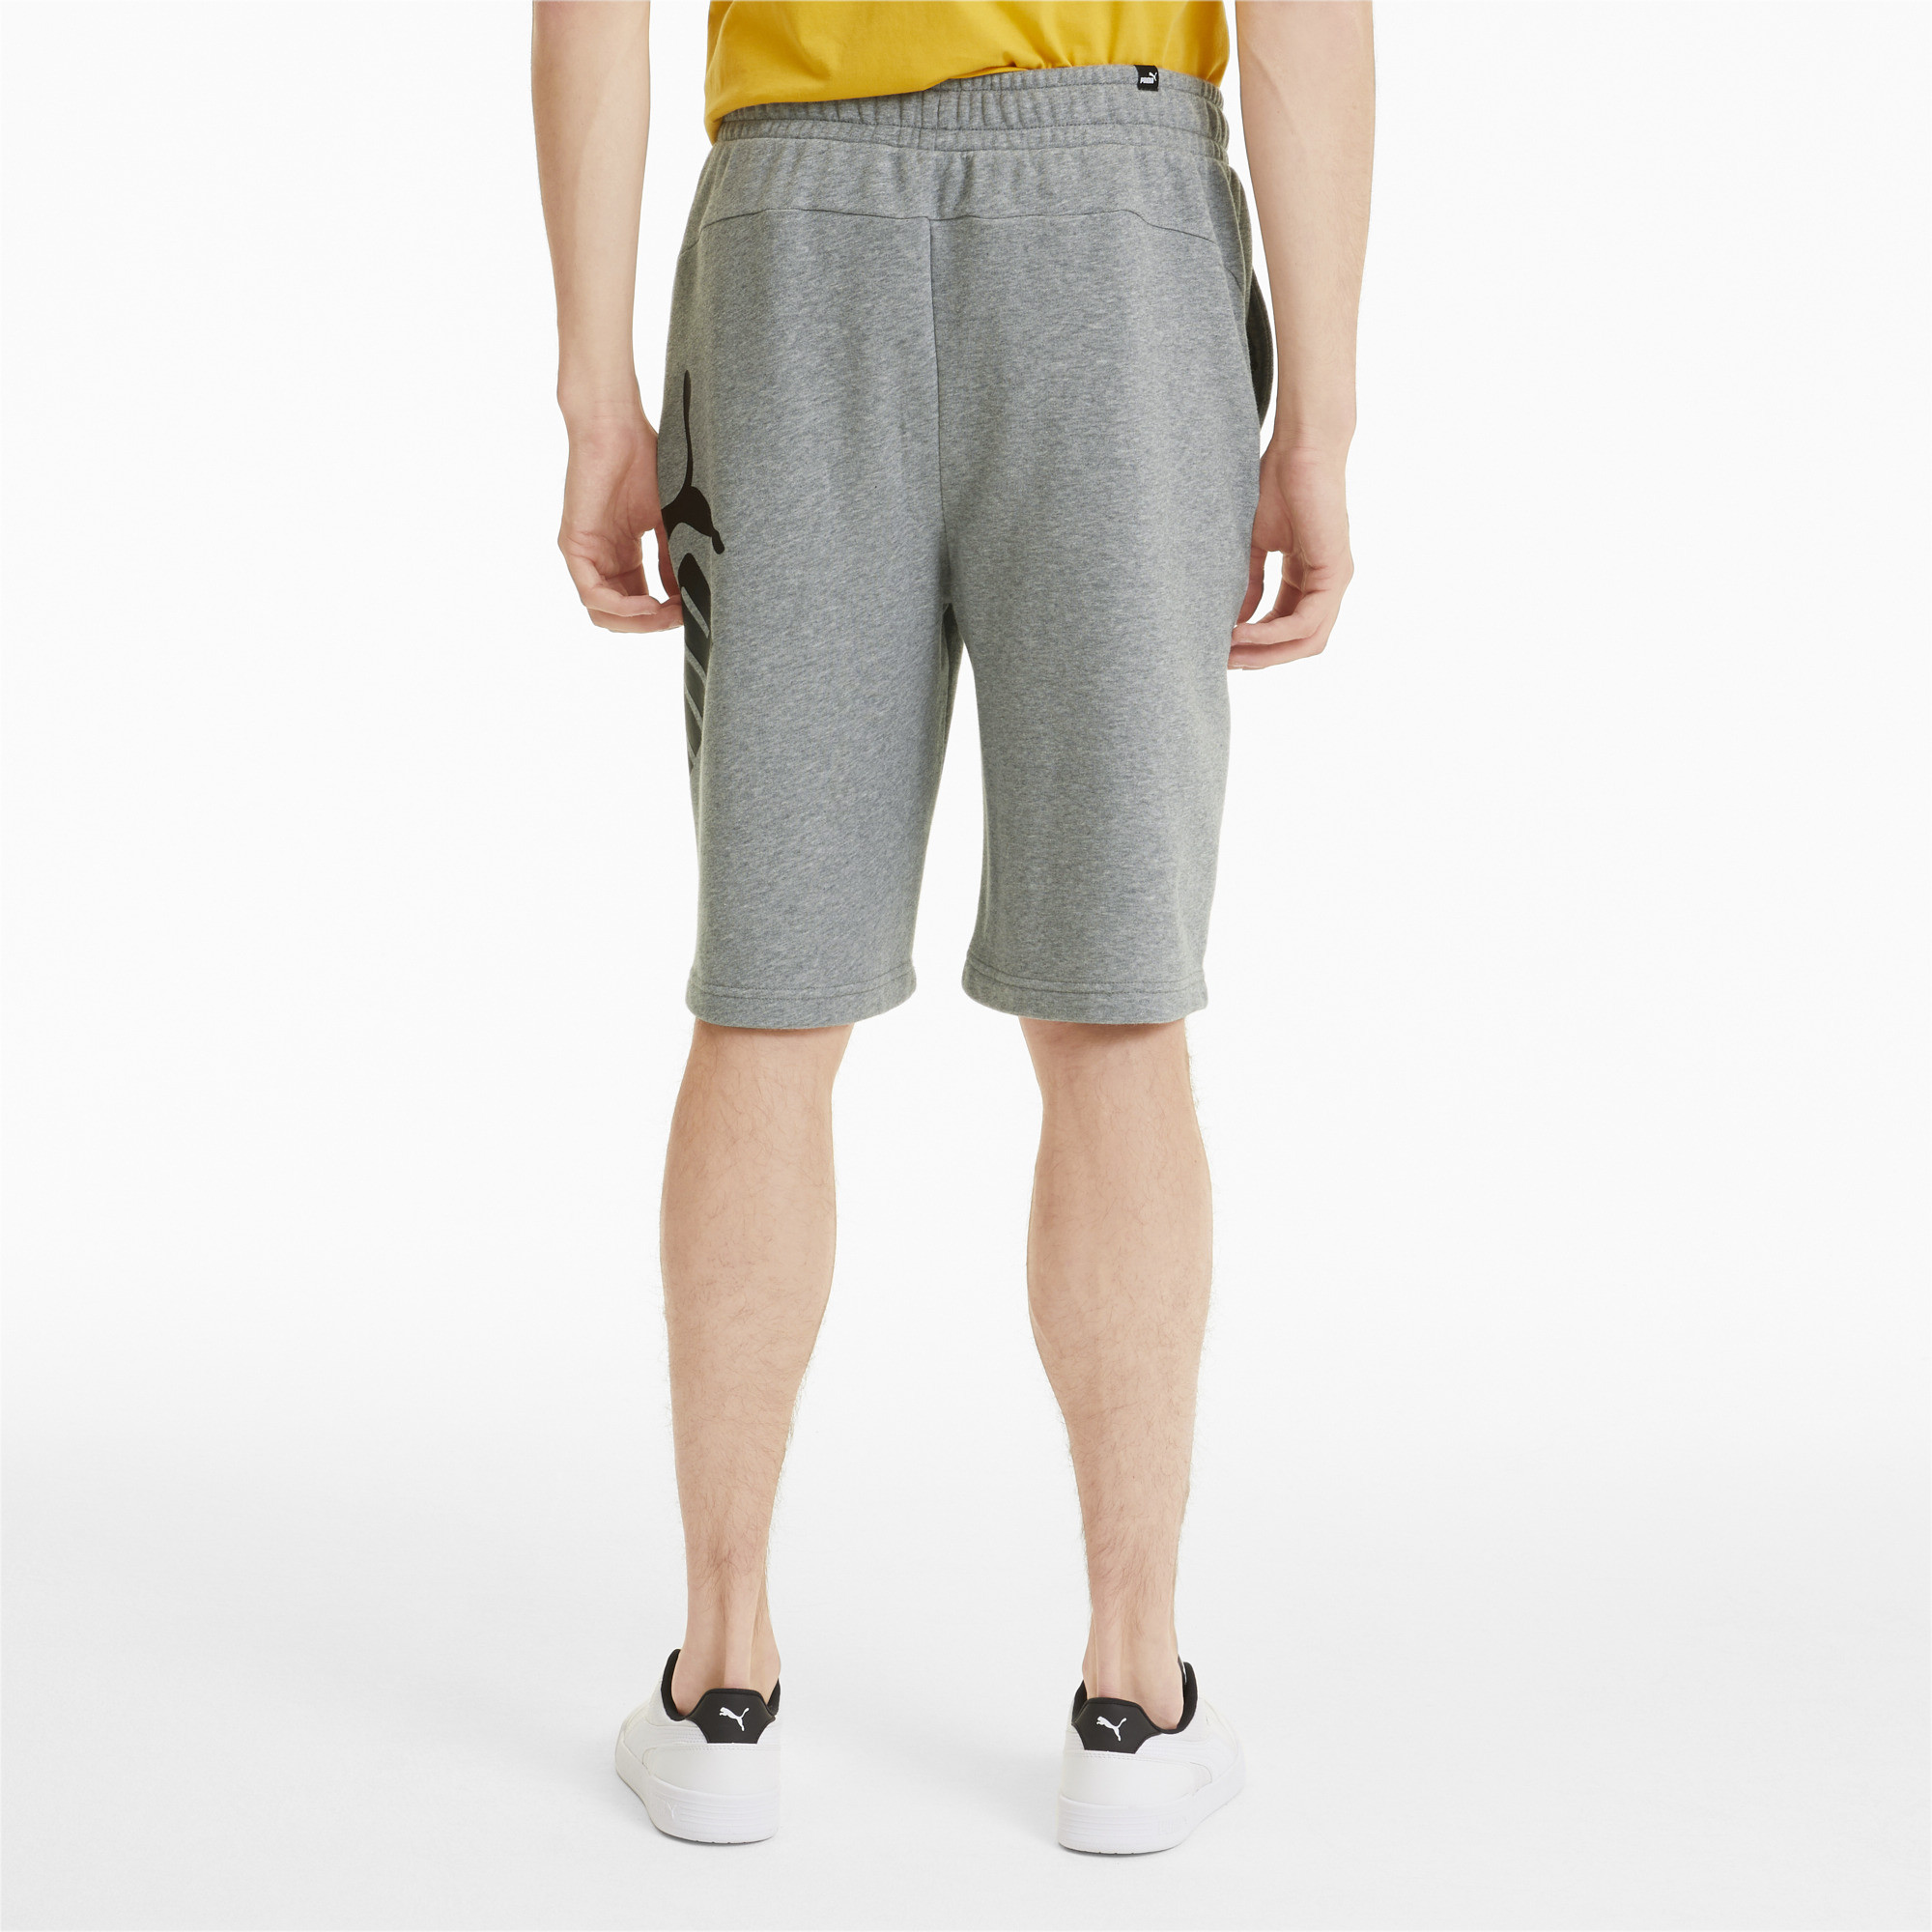 PUMA-Big-Logo-Men-039-s-Shorts-Men-Knitted-Shorts-Basics thumbnail 10